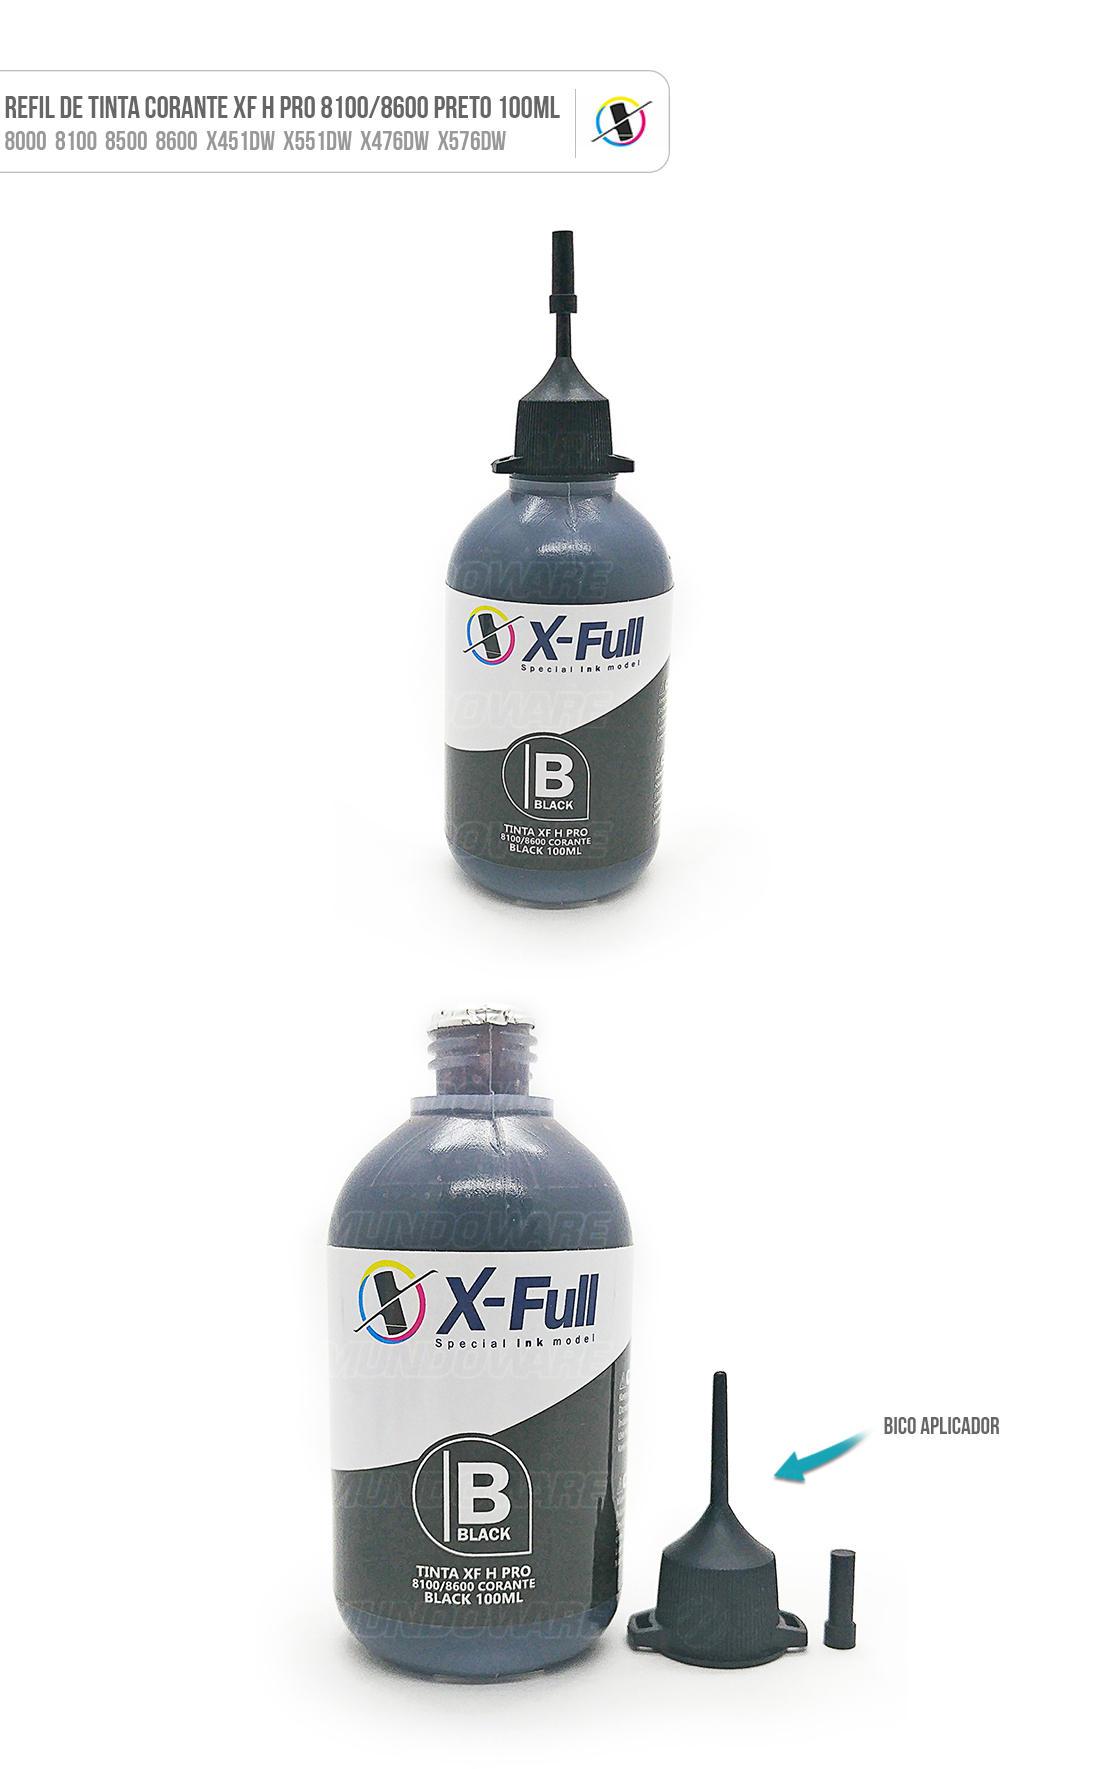 Tinta Preta Corante para Bulk-ink Tanque de Tinta impressora 8000 8100 8500 8600 X451dw X551dw X476dw X576dw